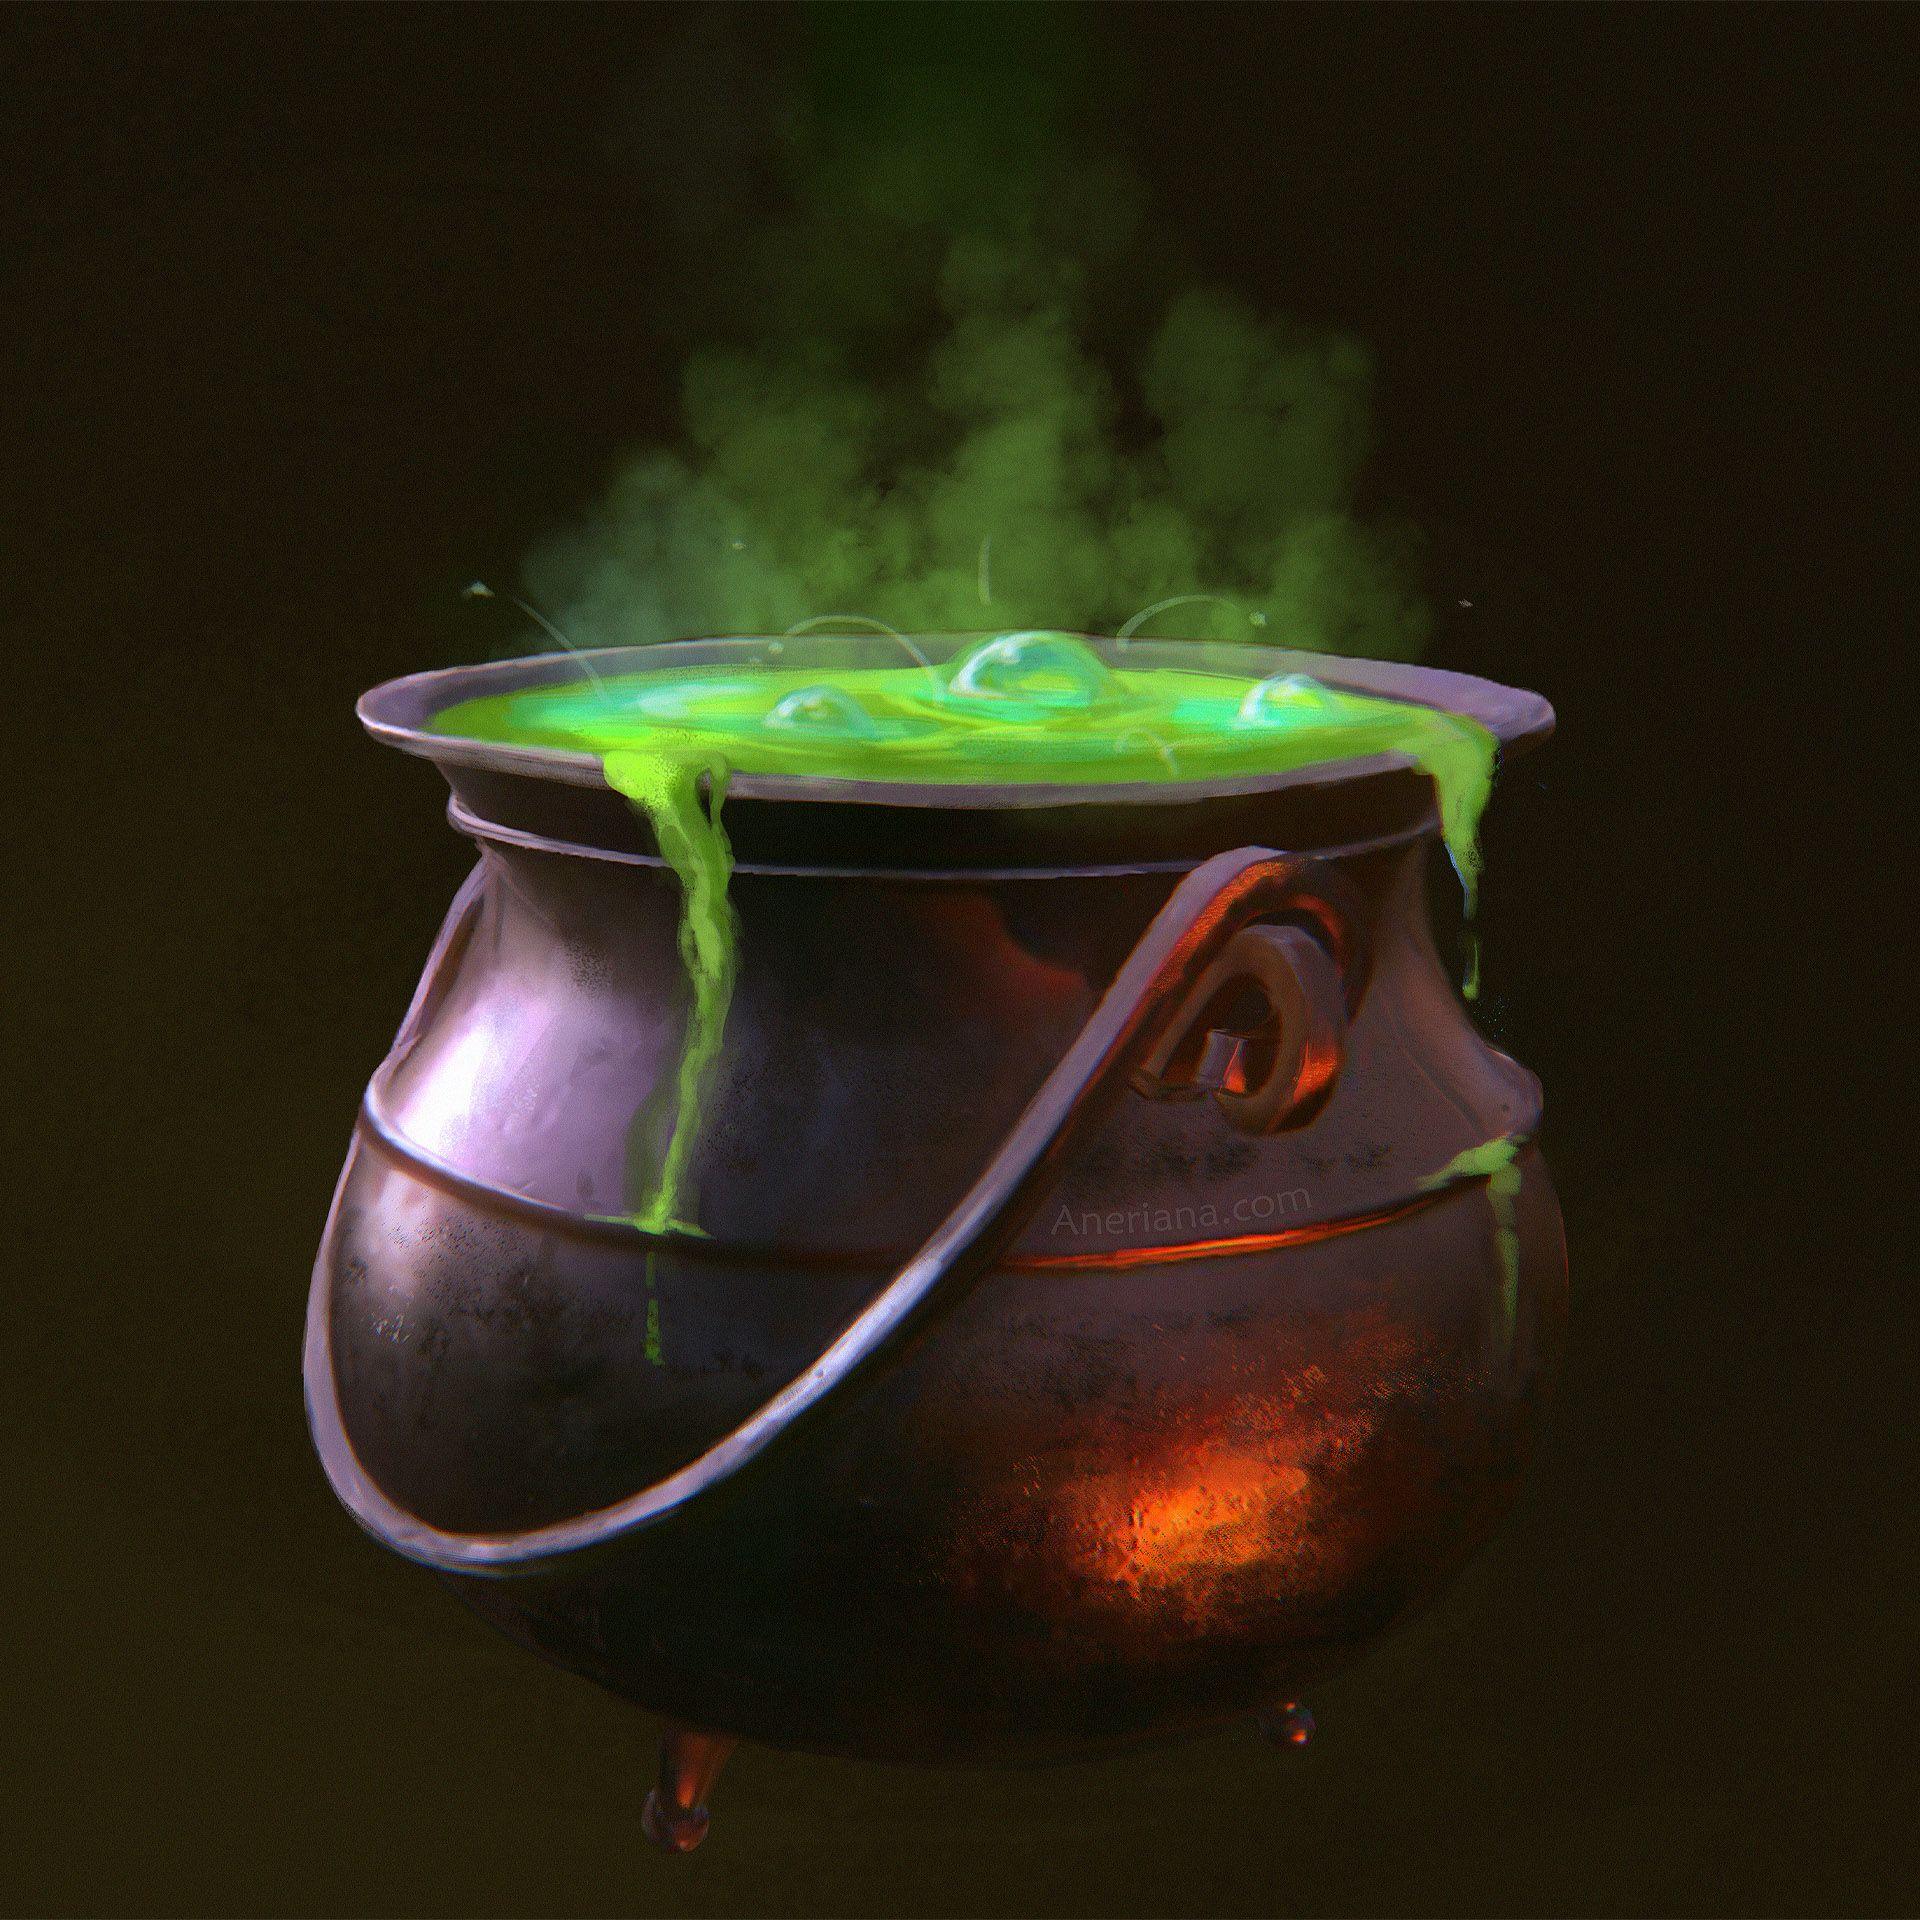 Aneriana on Twitter in 2021 | Halloween digital art, Cauldron, Witches  cauldron